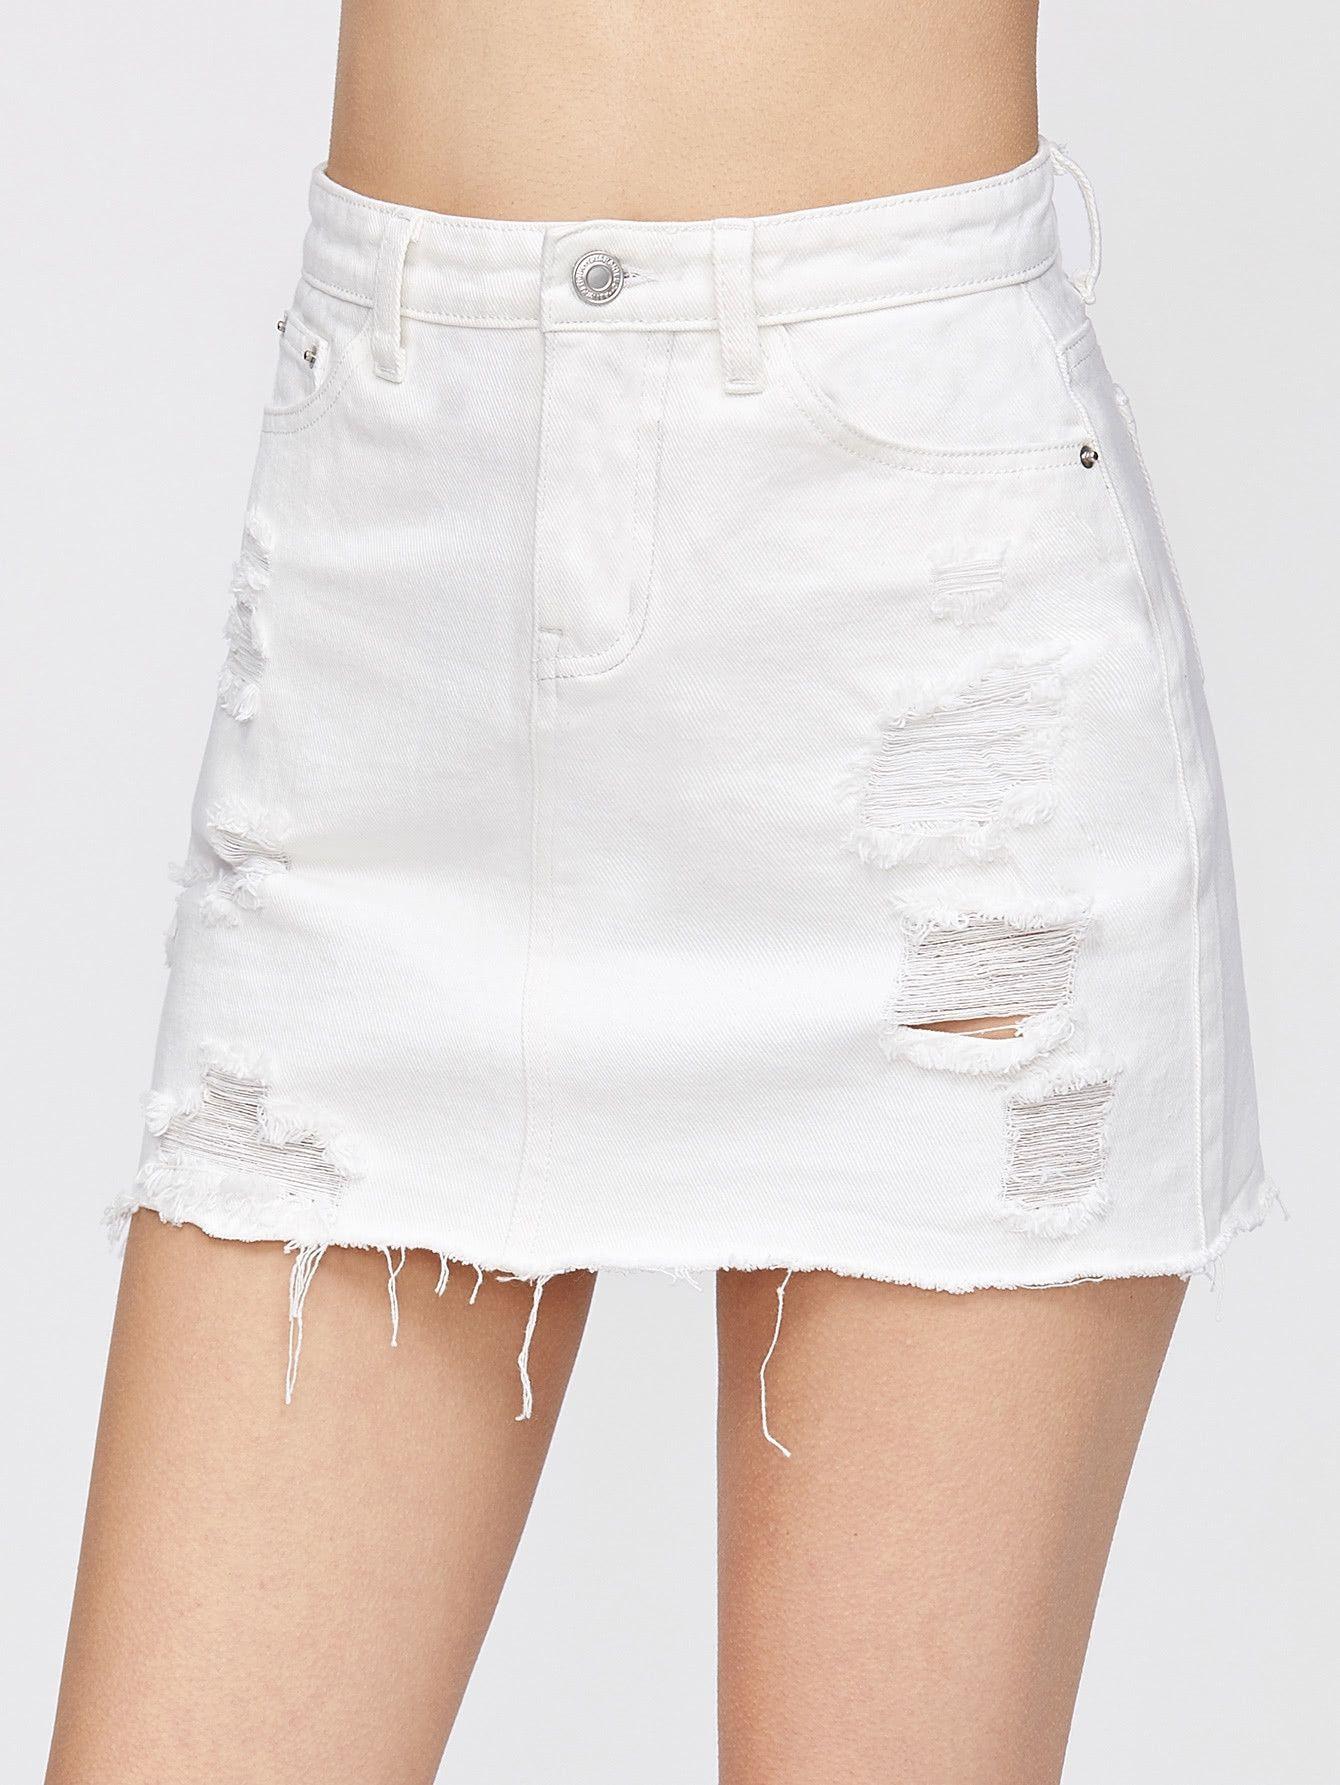 8e40f84876 SHEIN Distressed Fray Hem Denim Skirt Price in Egypt | Jumia ...